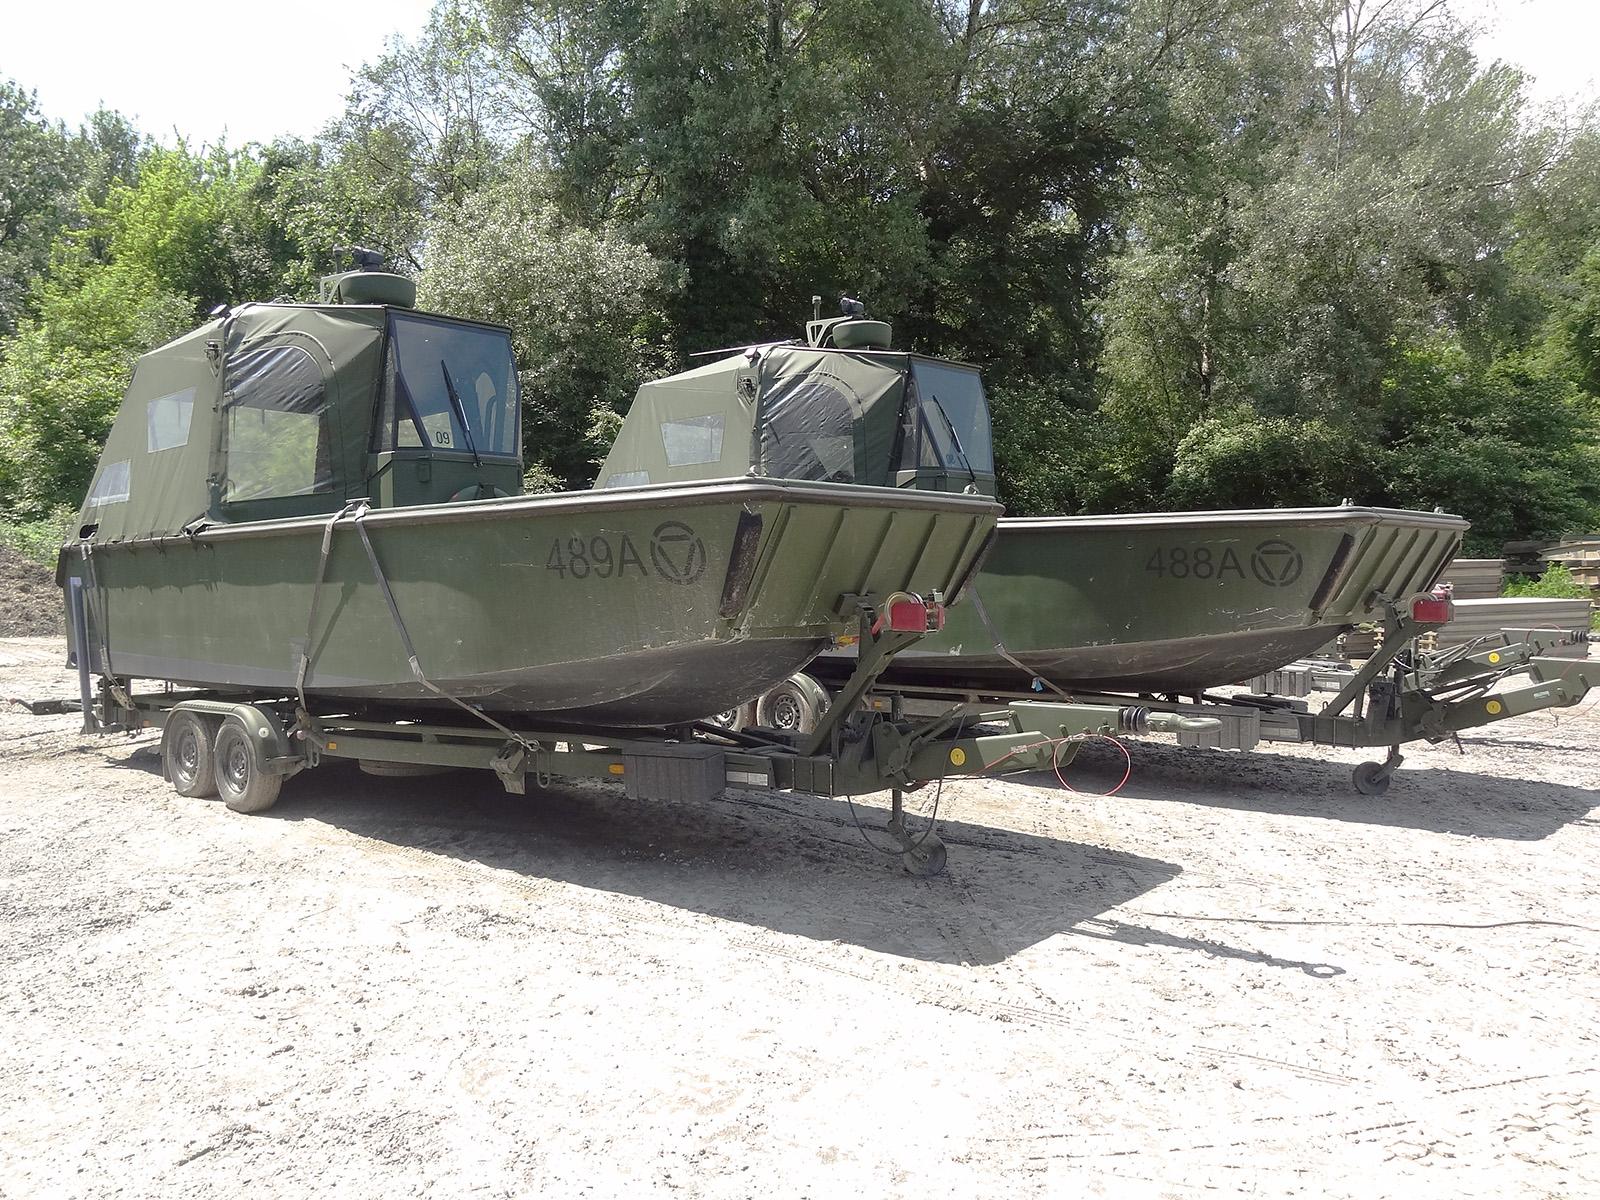 Arbeits- und Transportboot auf Harbeck BT20-35V Anhänger © Doppeladler.com